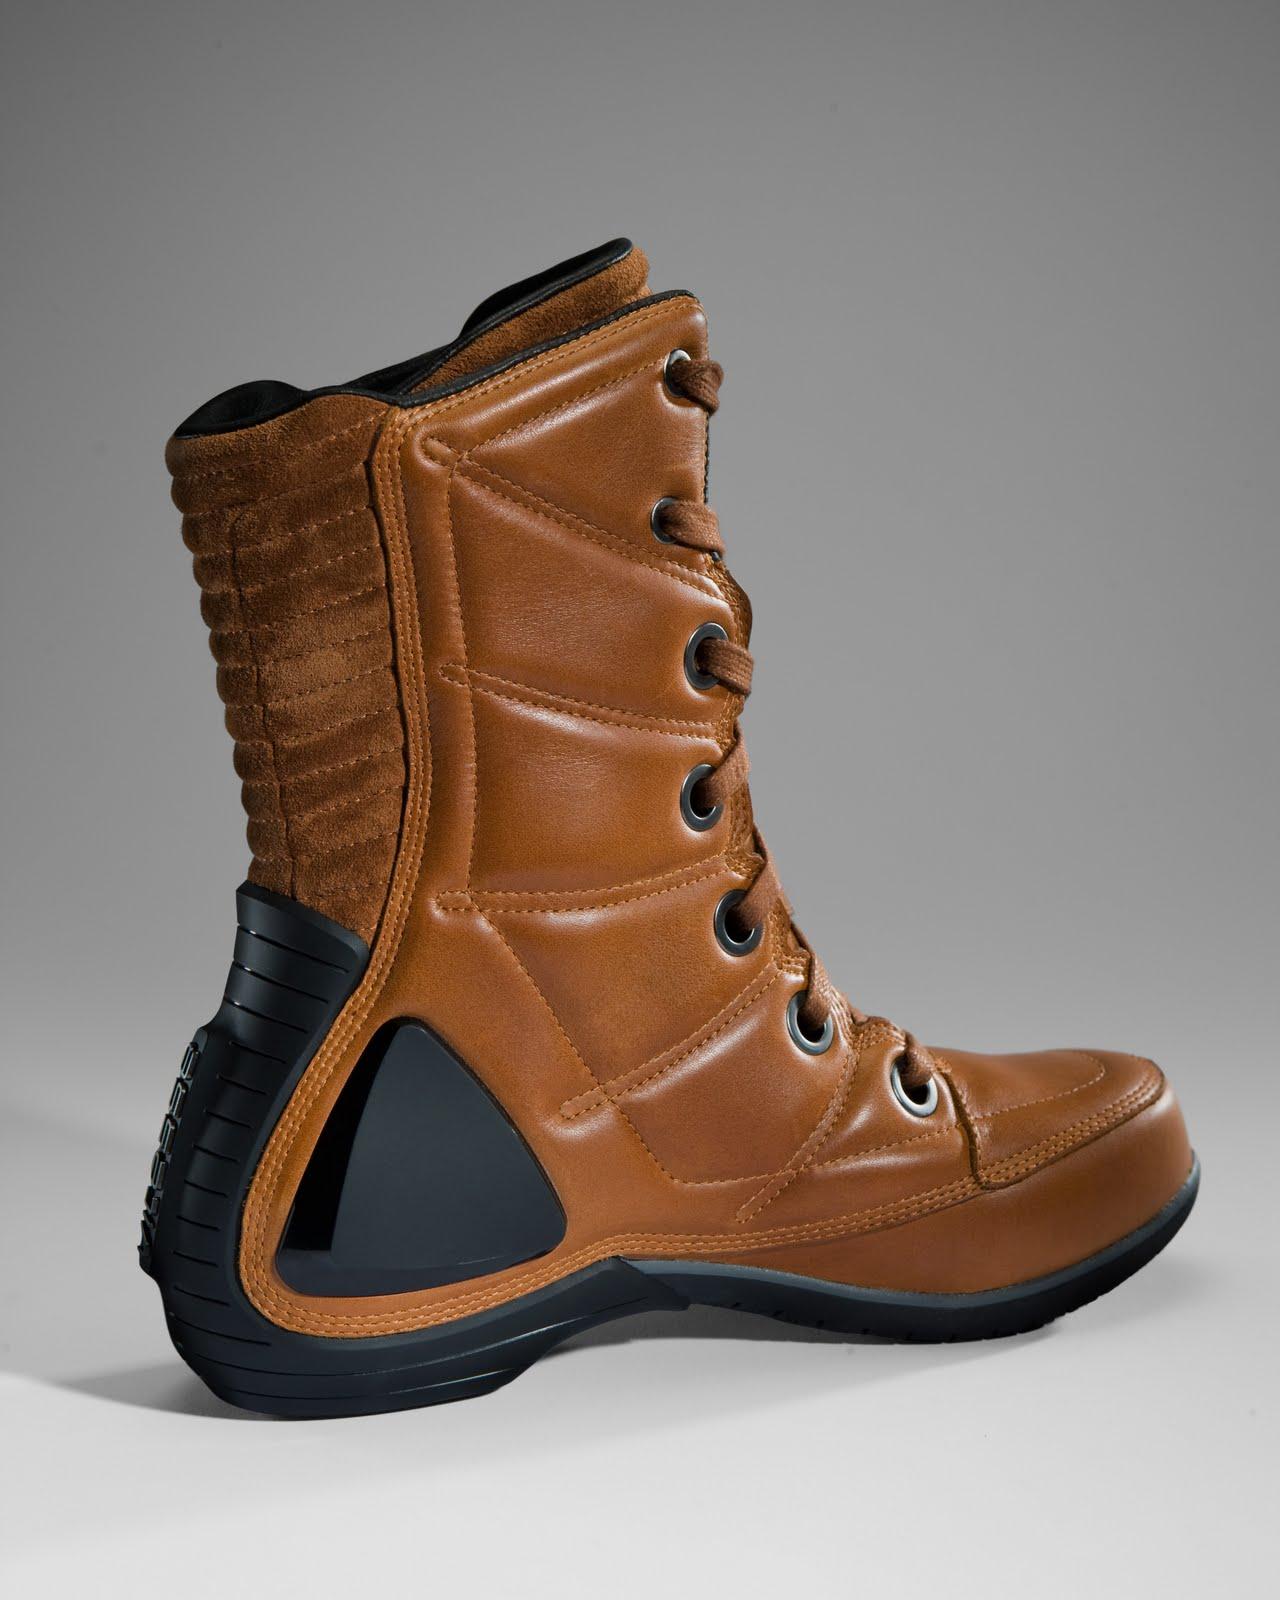 acheter bottes moto vintage daytona baskets chaussures pour femme et homme fradett. Black Bedroom Furniture Sets. Home Design Ideas